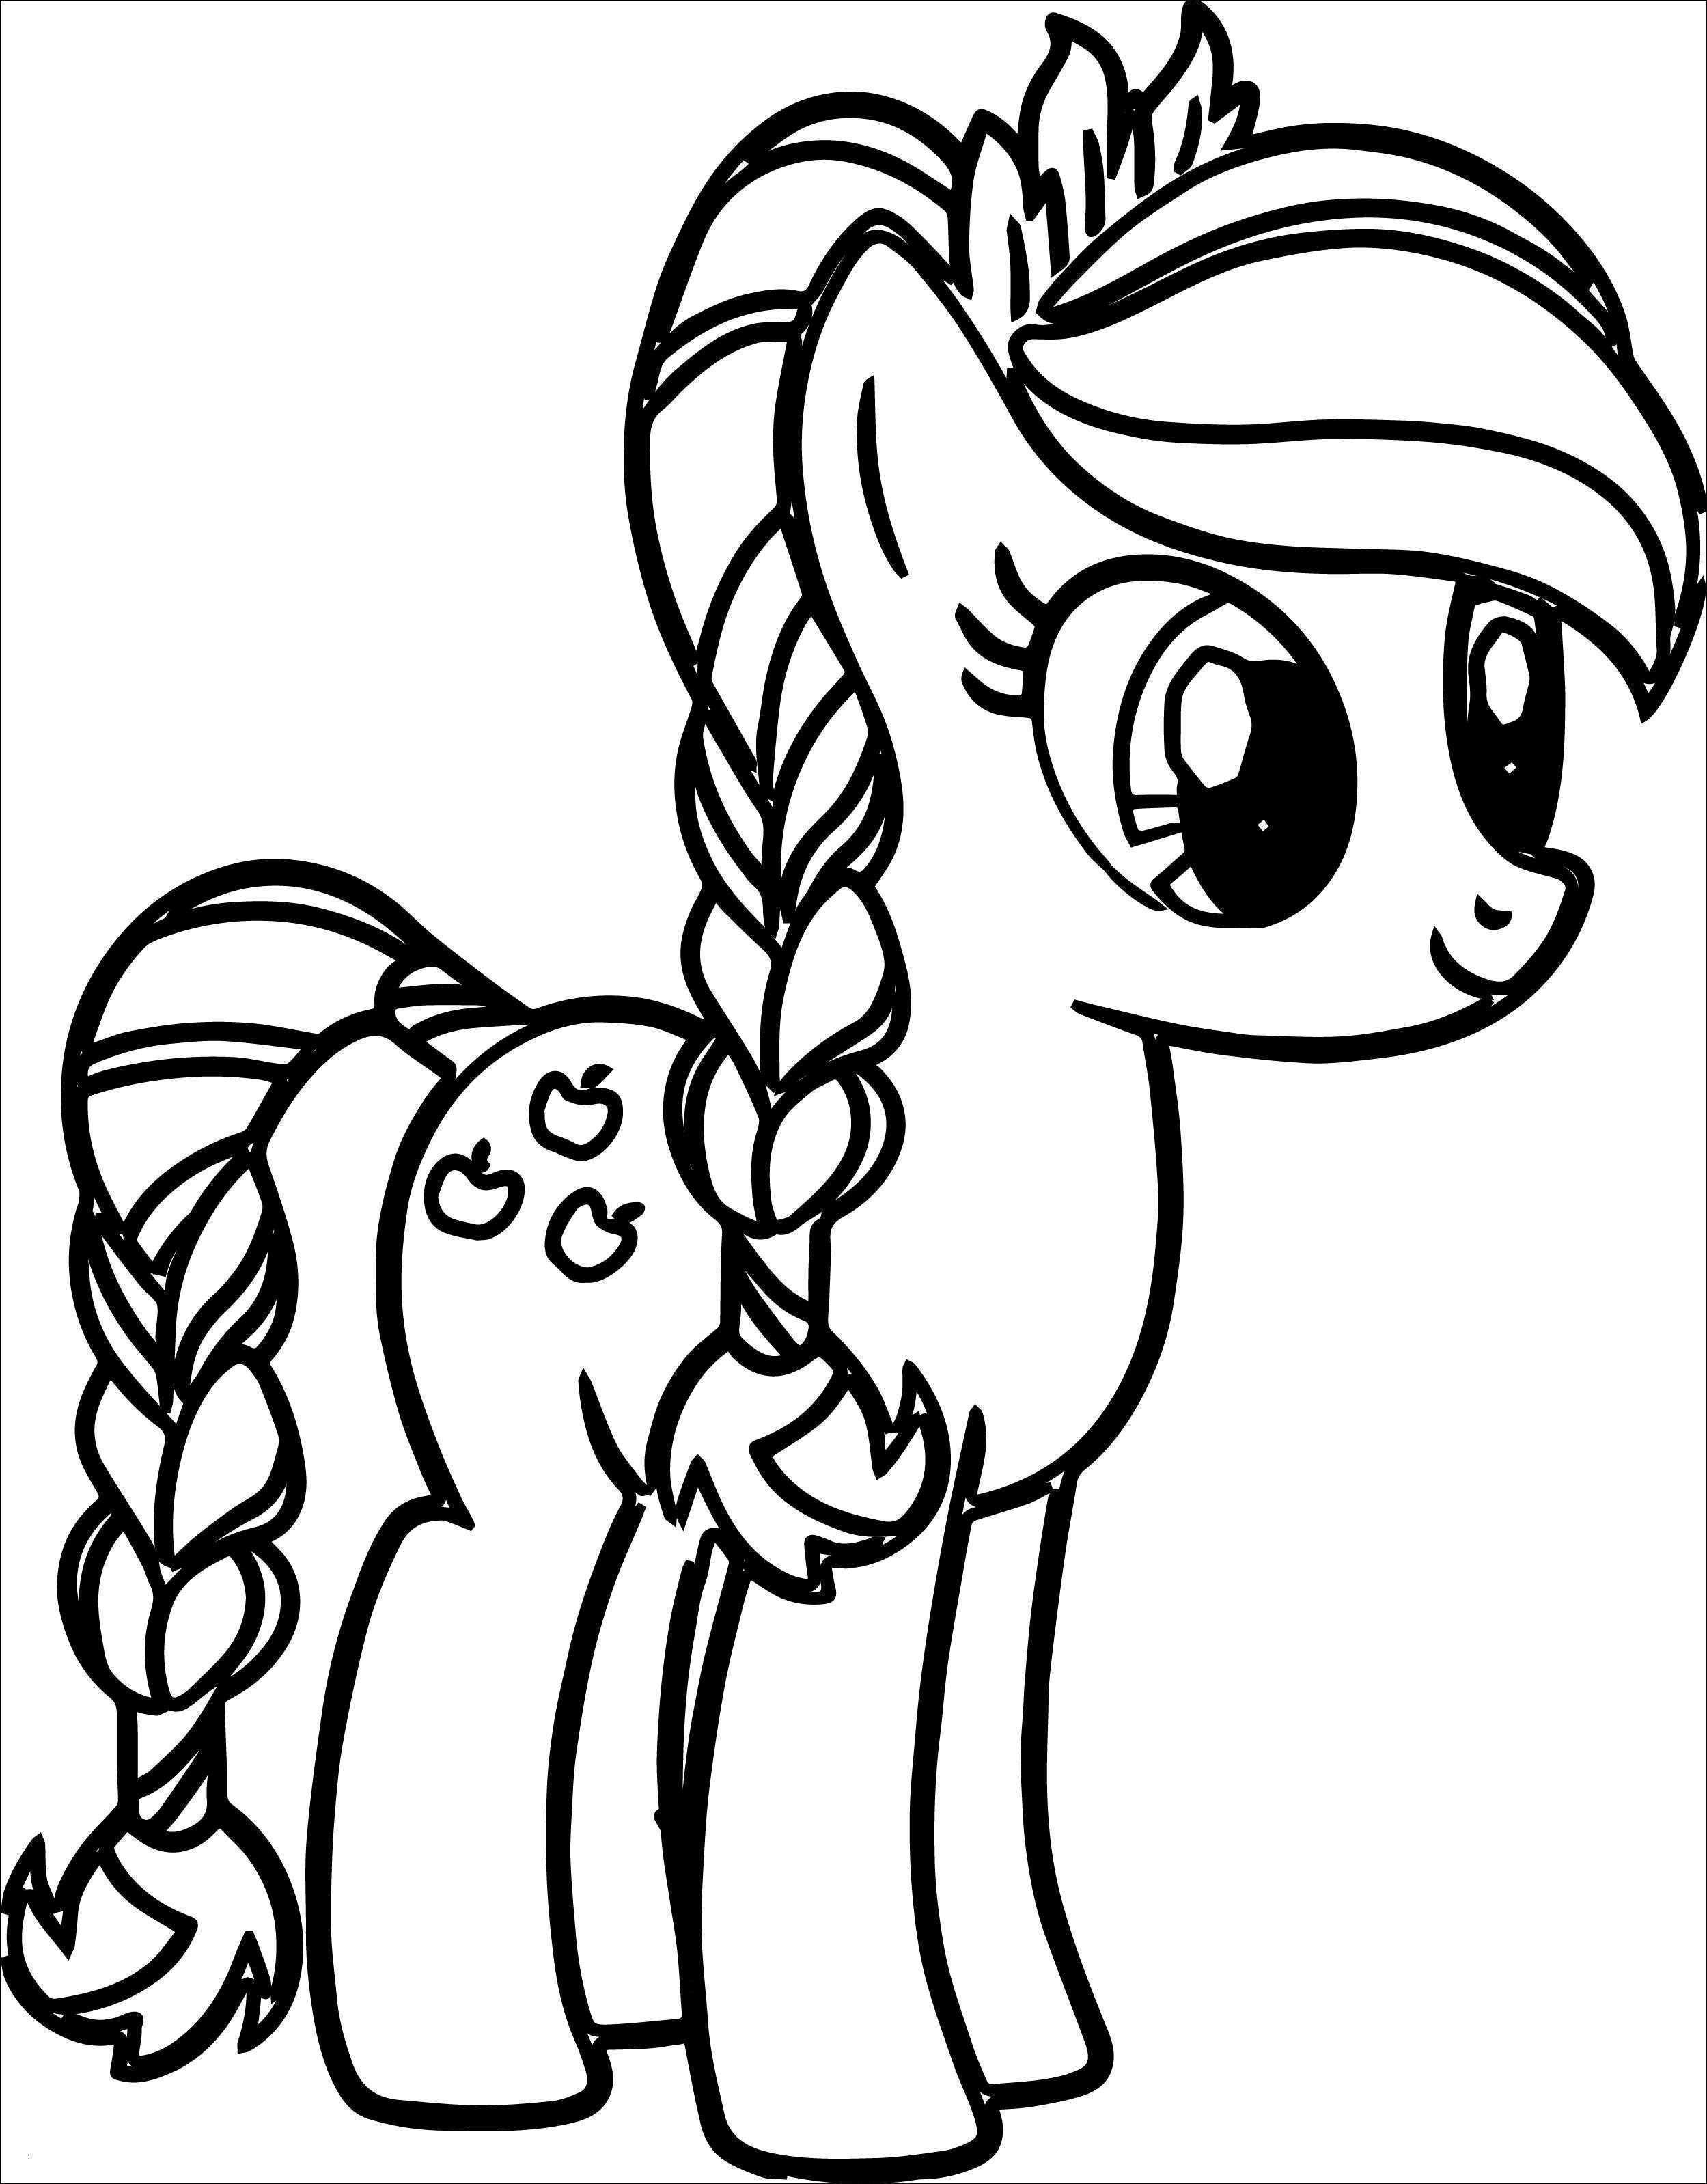 Ausmalbild My Little Pony Neu My Little Pony Ausmalbilder Bildnis 38 Ausmalbilder Little Pony Bild